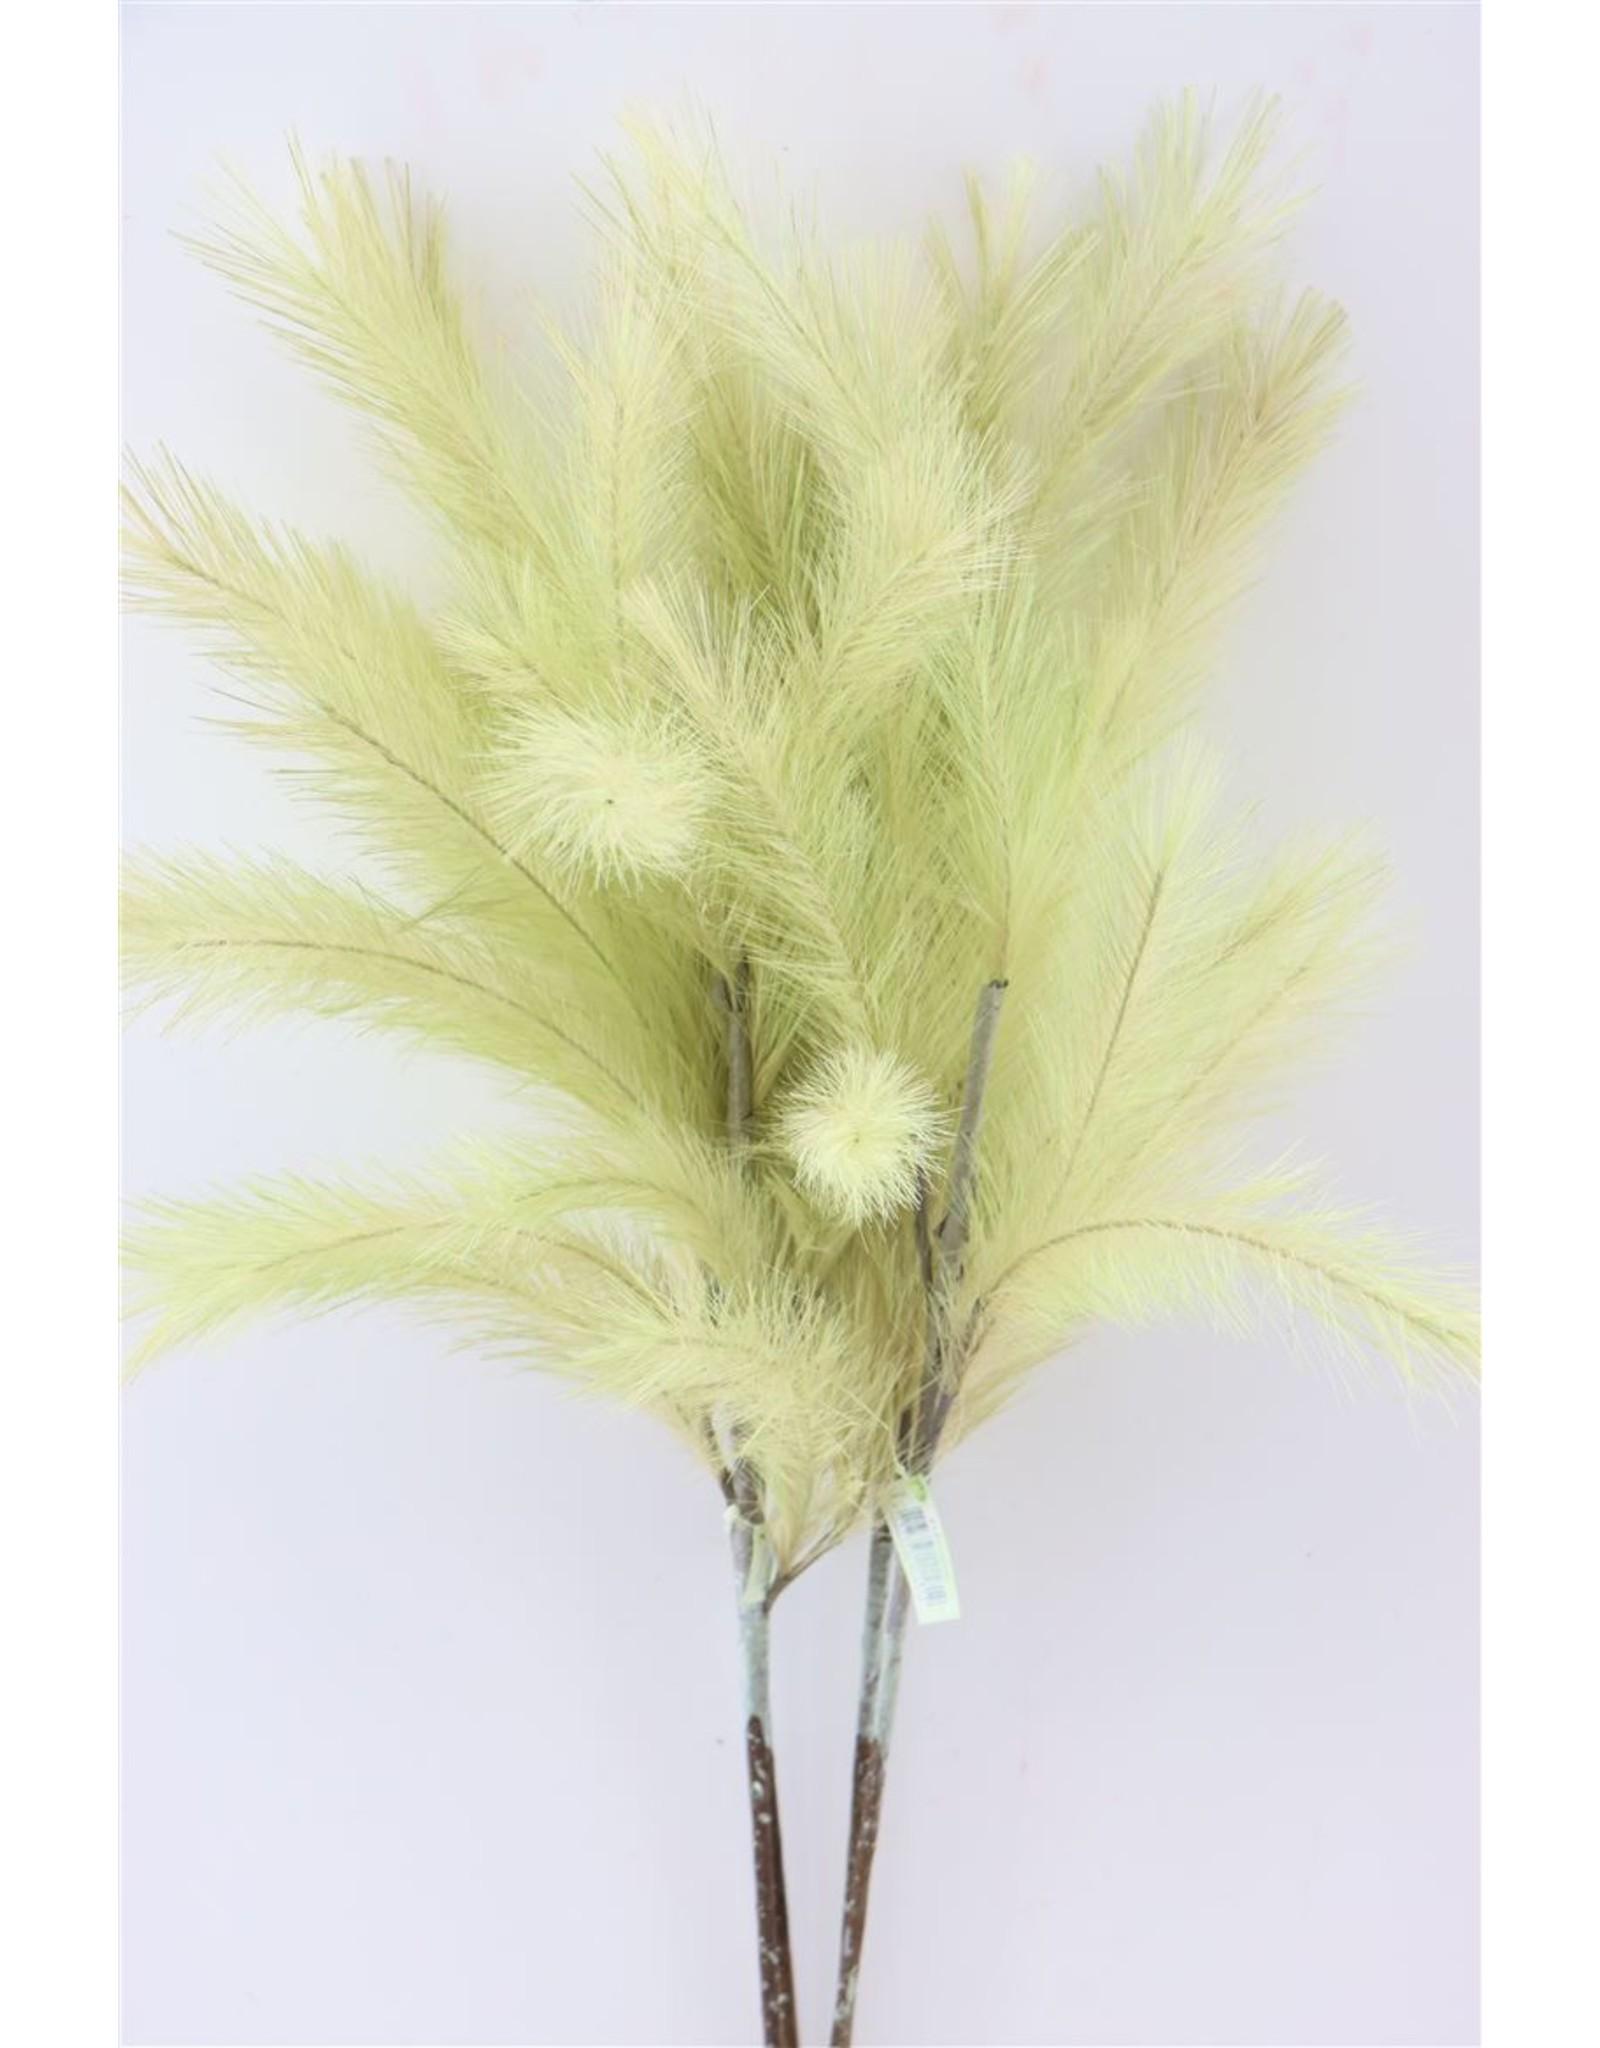 GF Deco Panicle Grass 75cm Mint Green P. Stem x 4